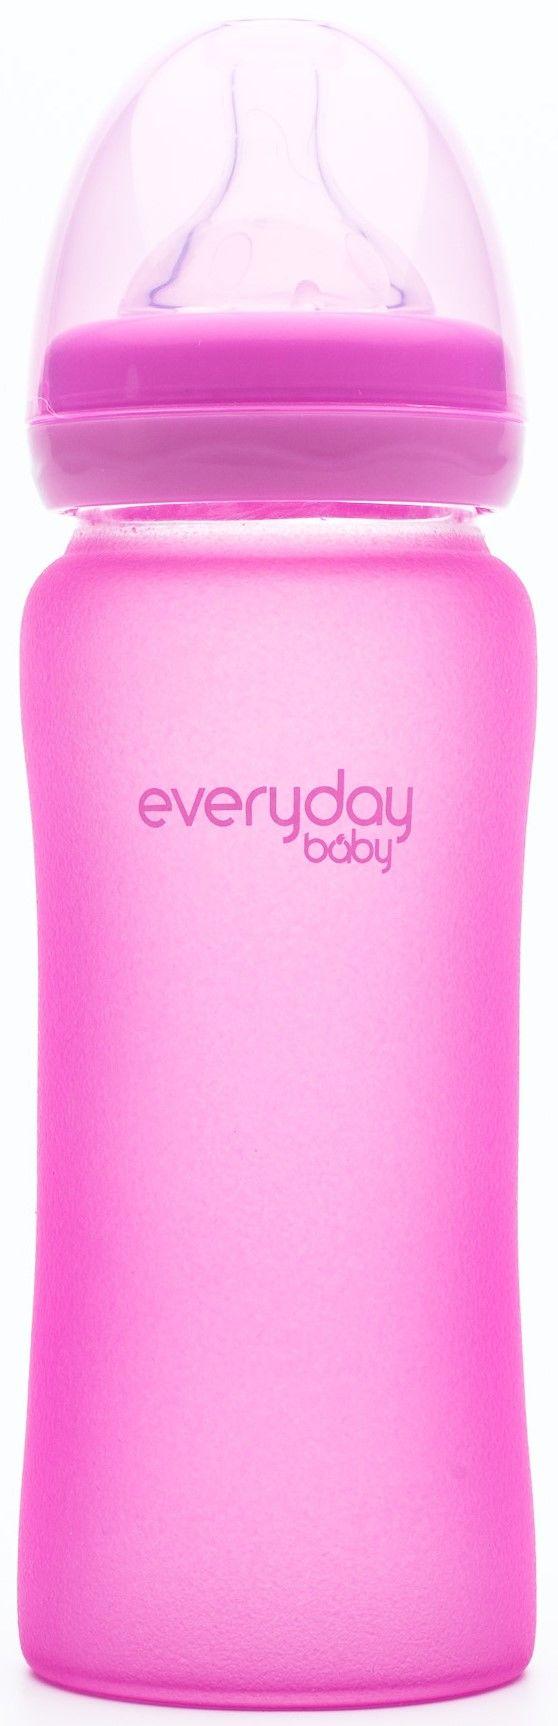 Everyday Baby Nappflaska Värmin 300ml,Cerise Pink